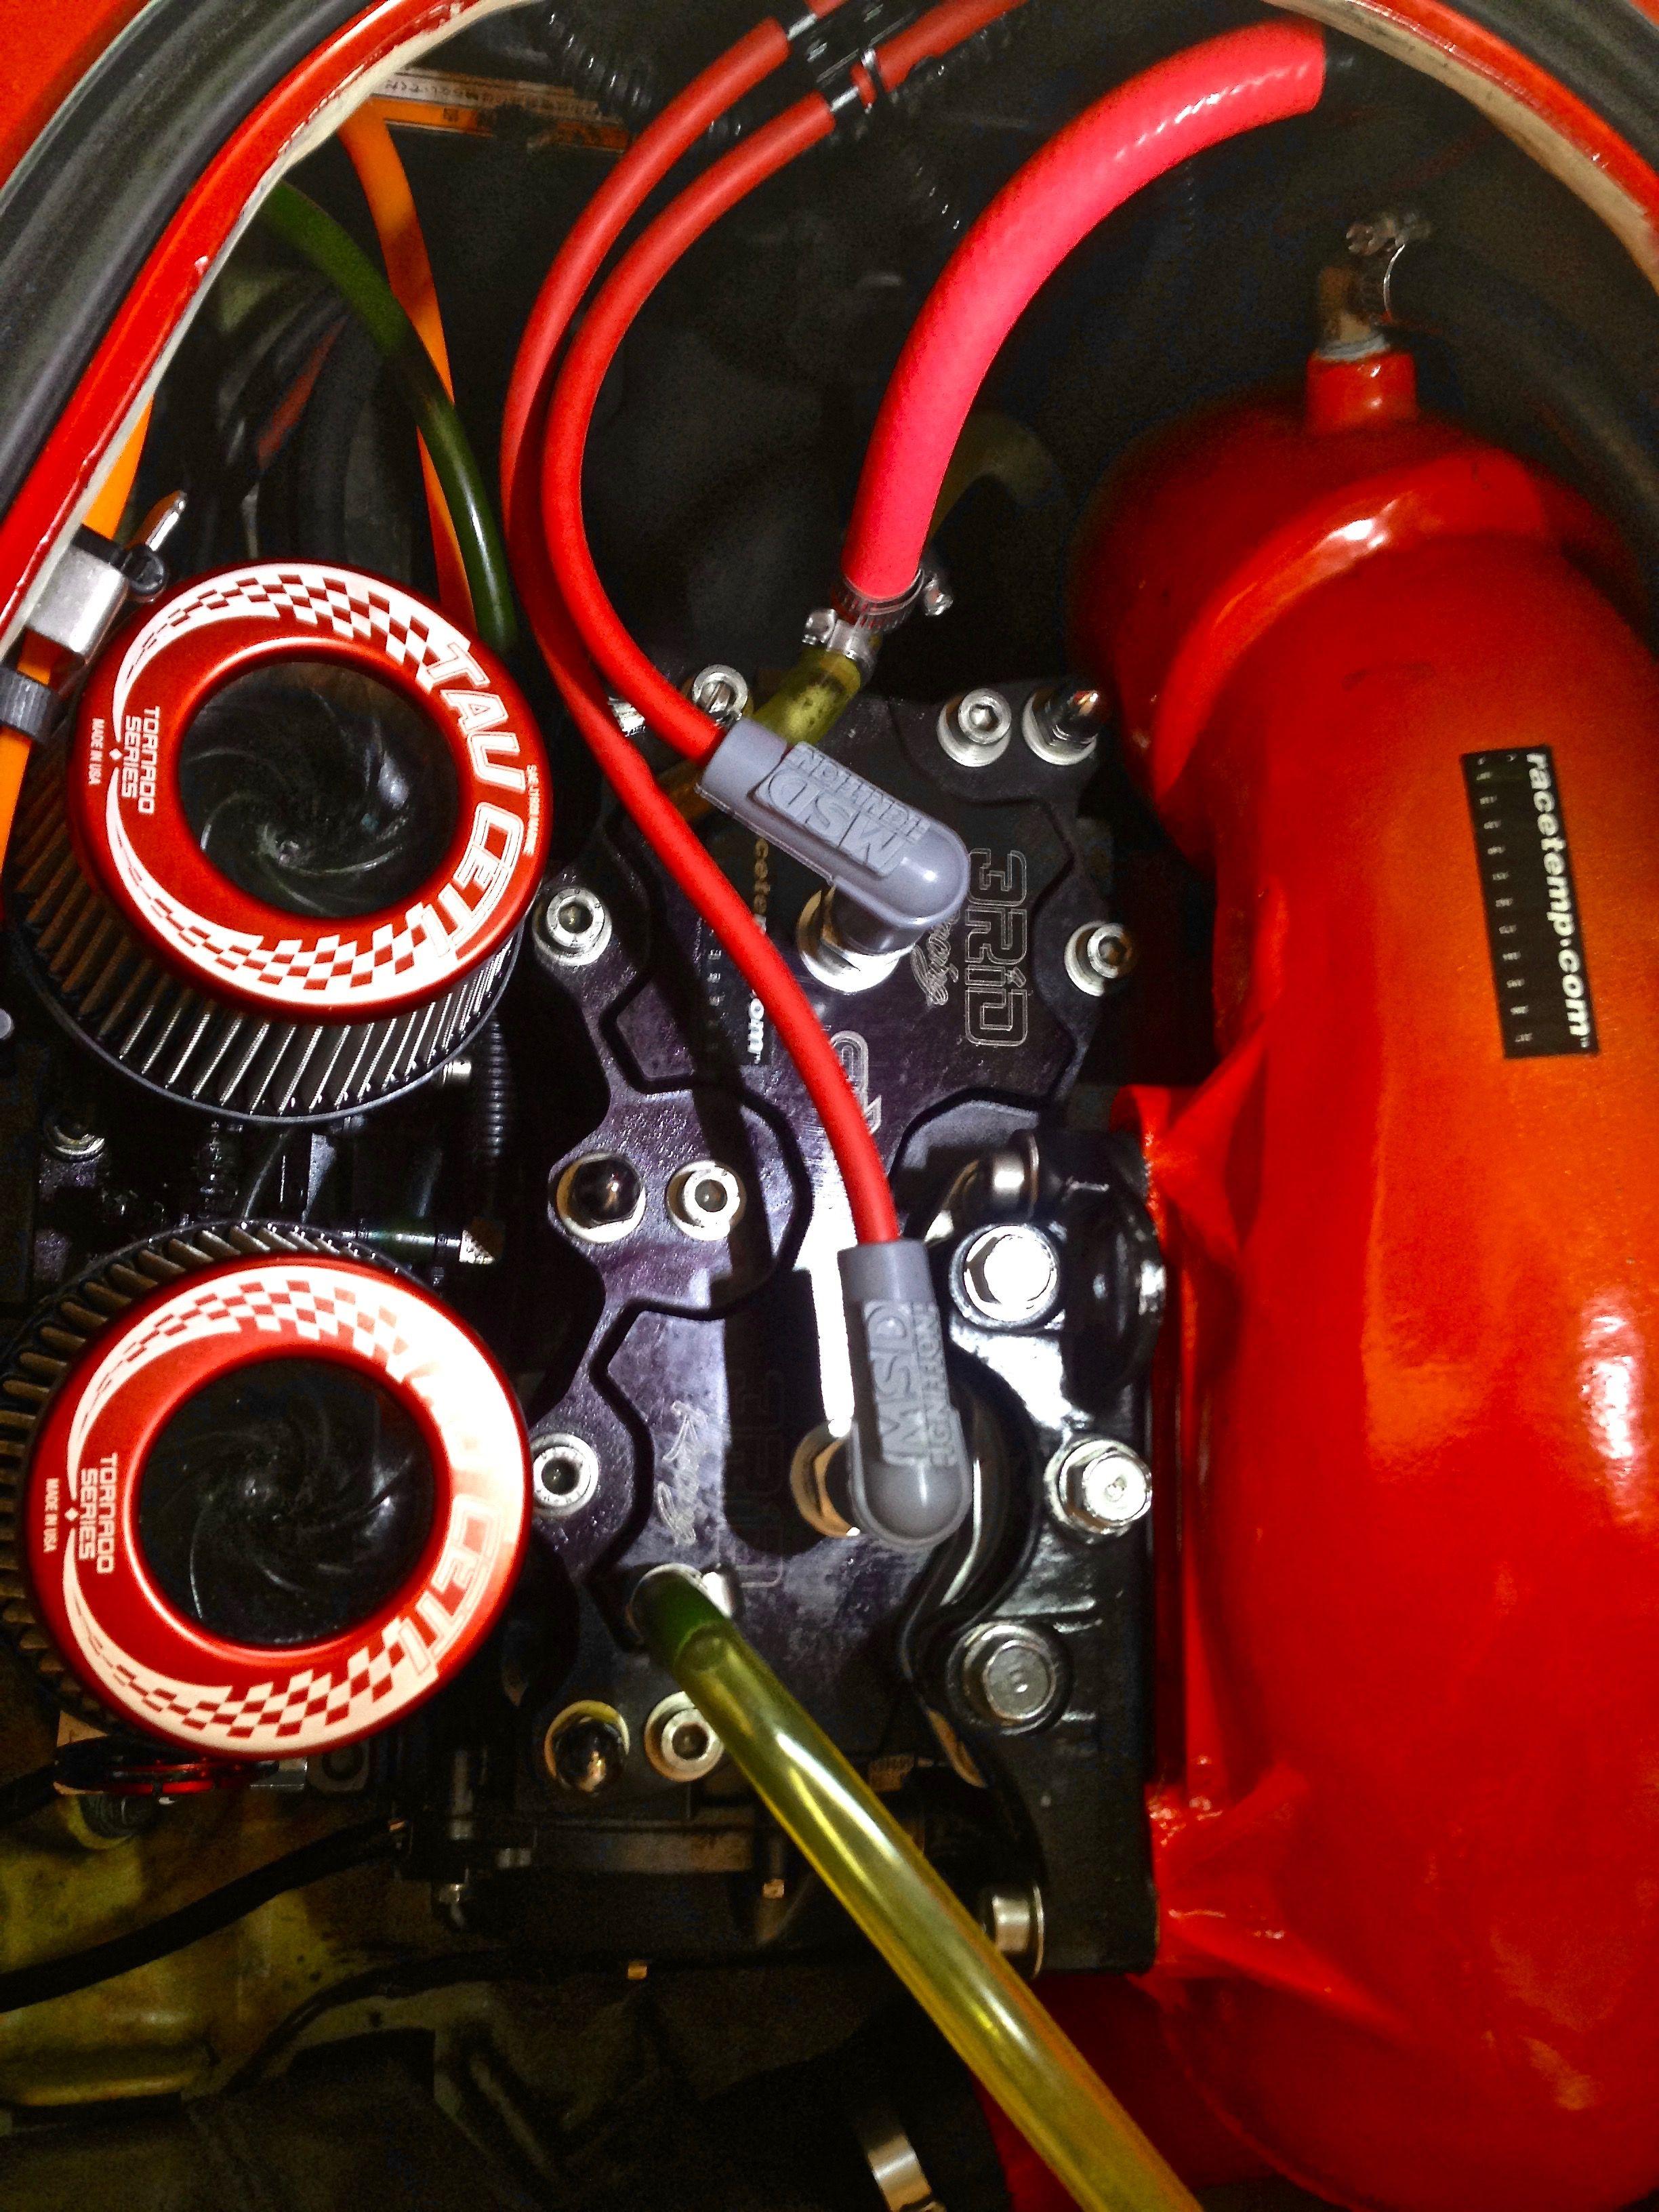 Blaster 1 760 cc Riva exhaust pipe modified etc